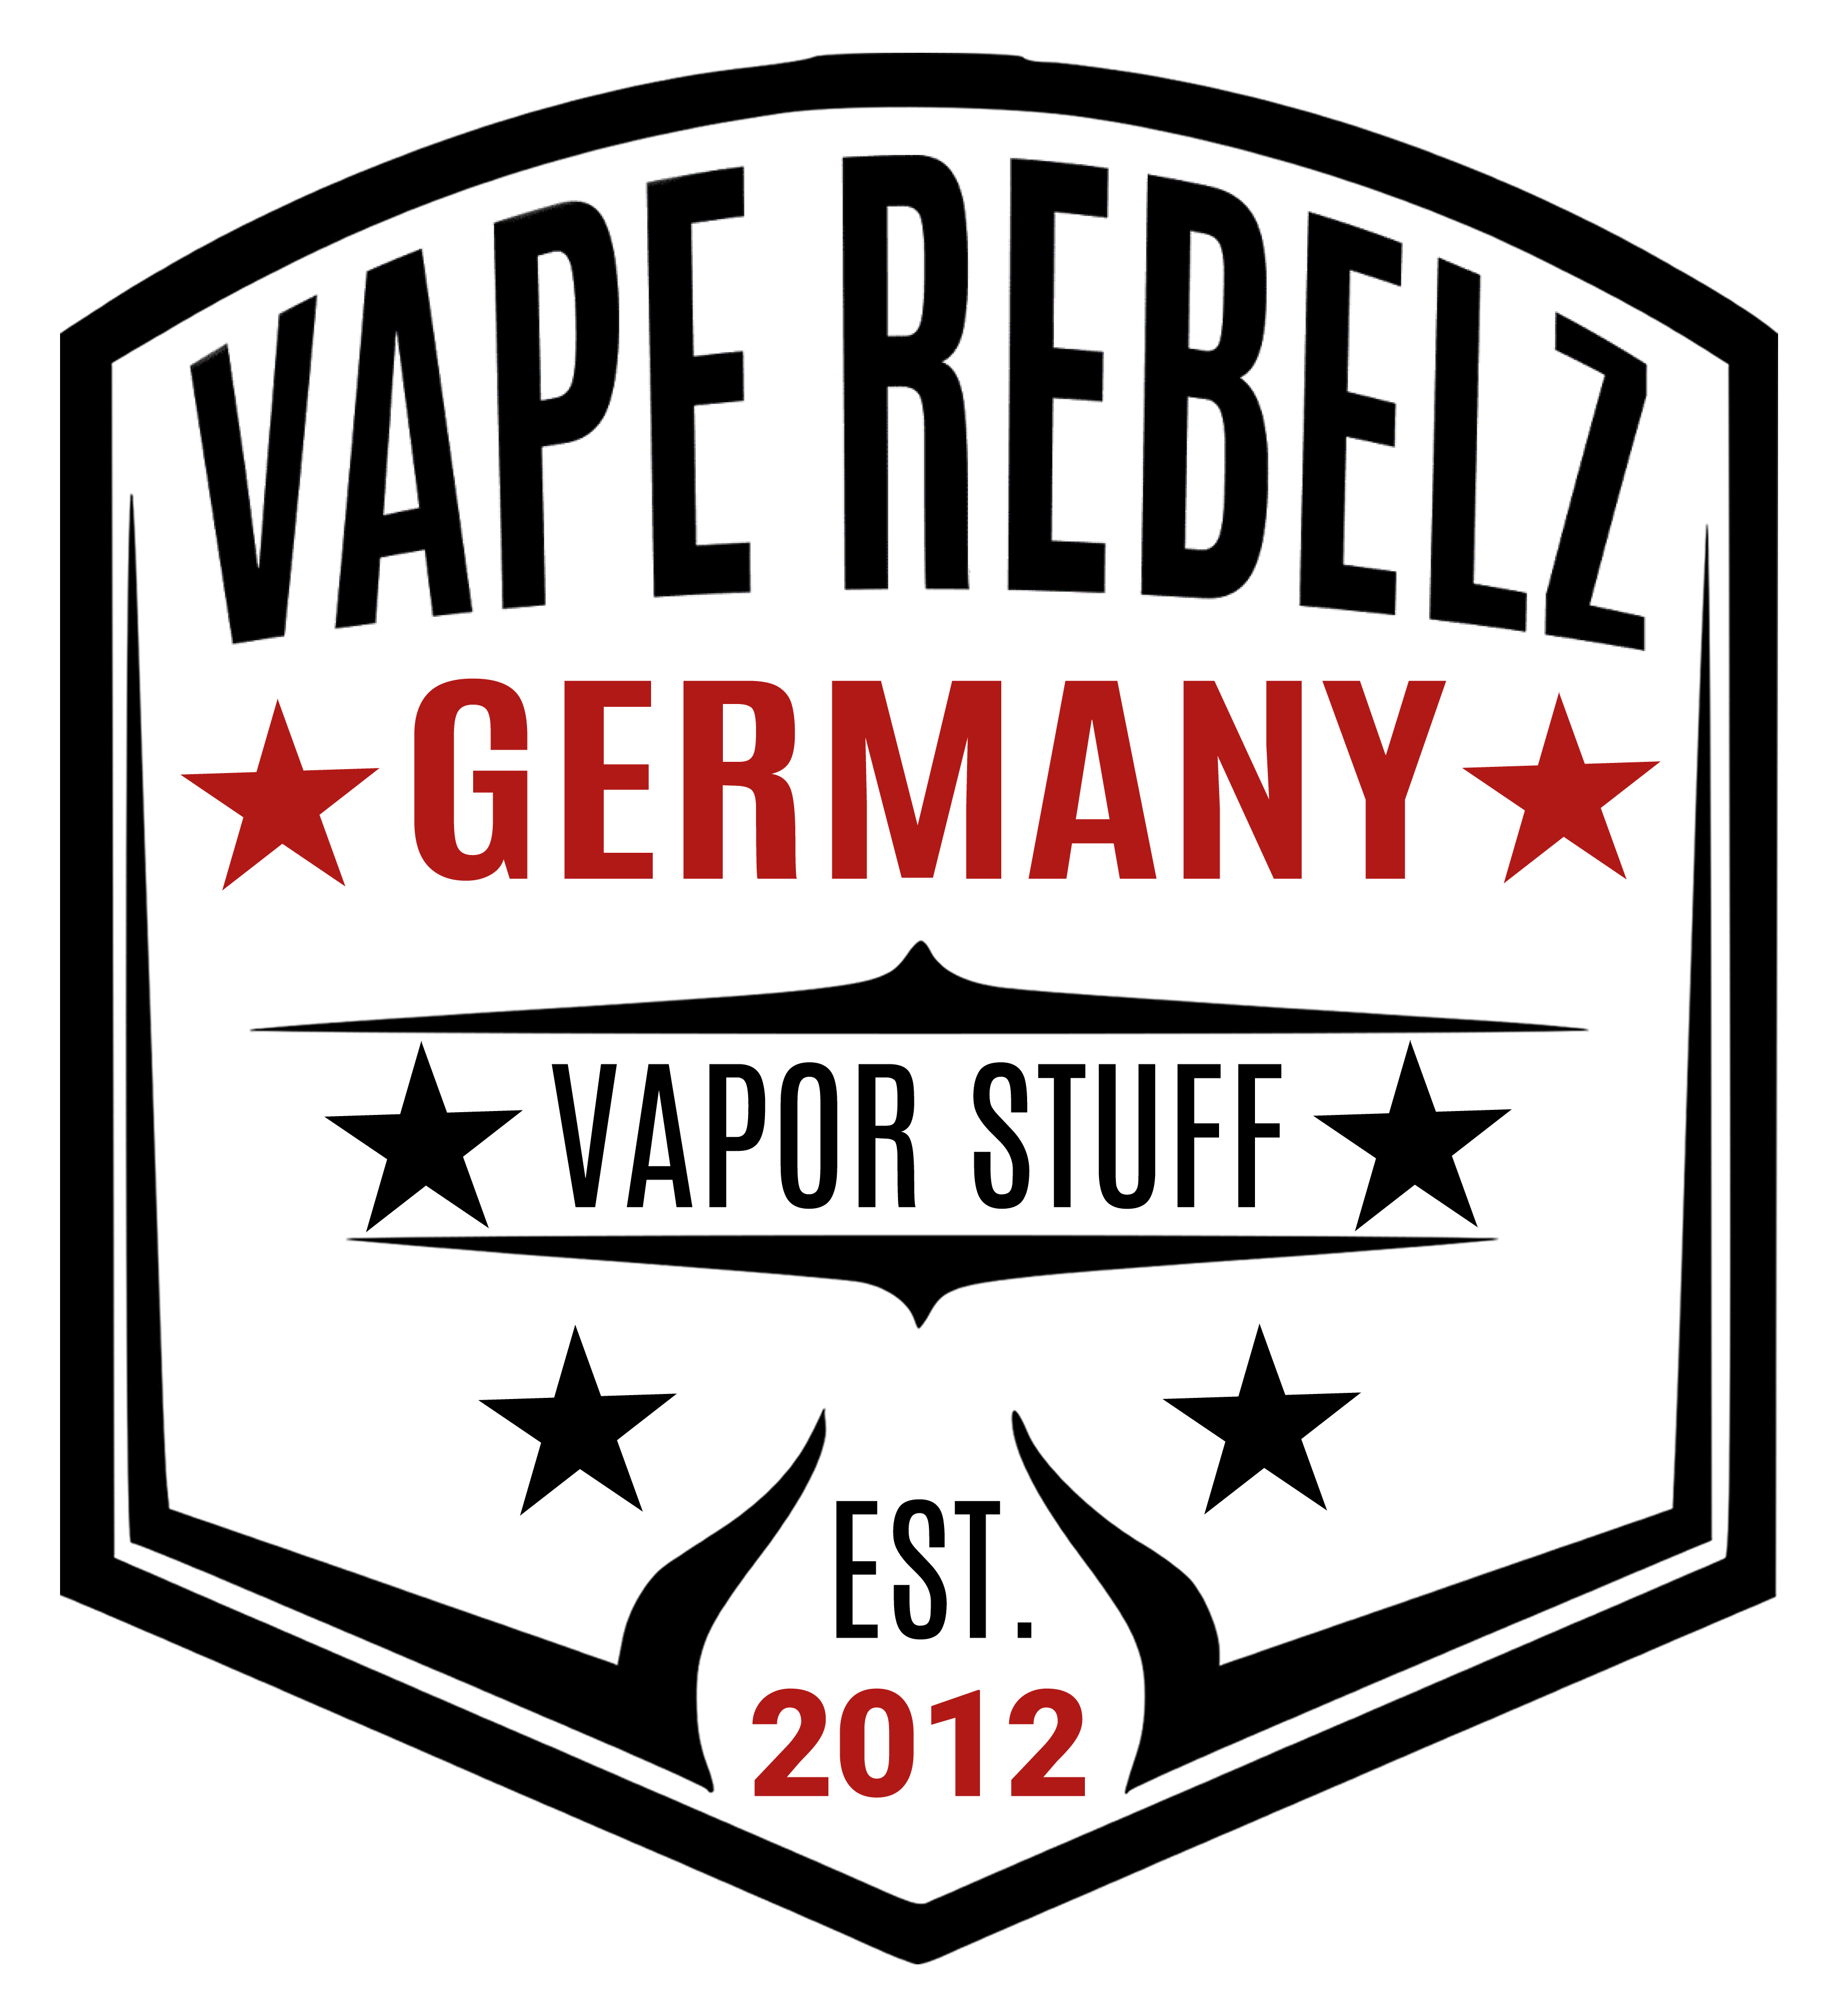 Vape Rebelz ®